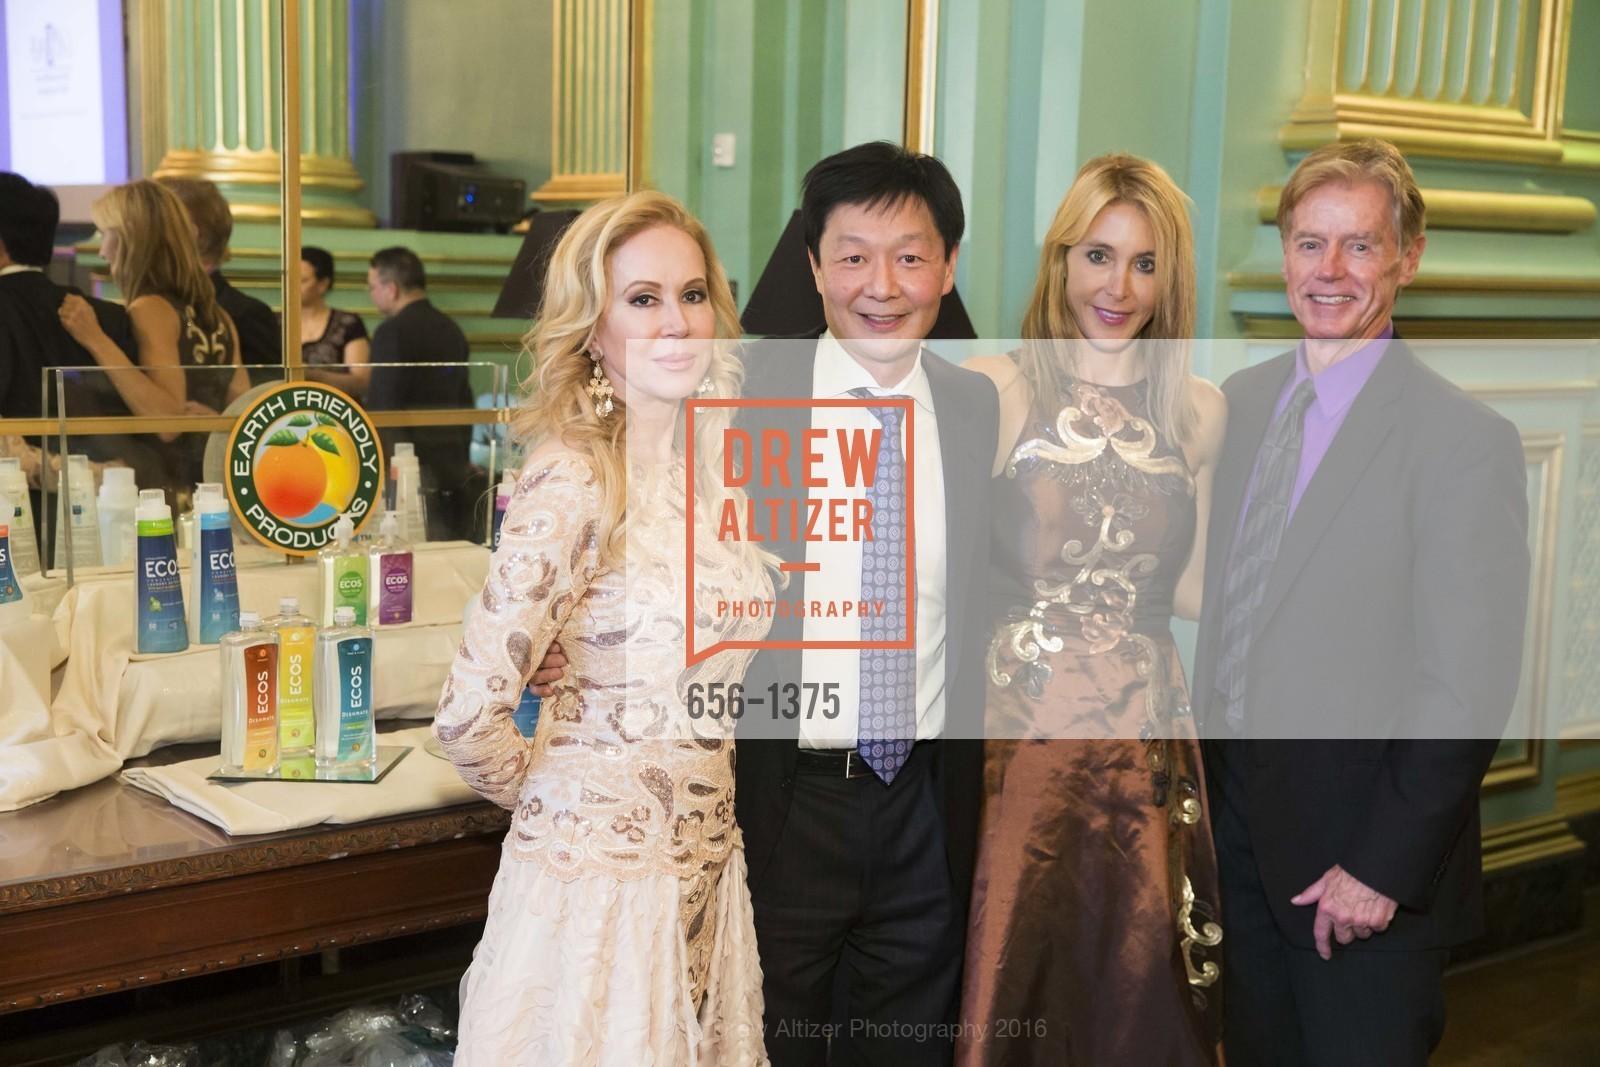 Sophie Azouaou, Albert Chow, Eileen Blum-Bourgade, Ken Henderson, Photo #656-1375